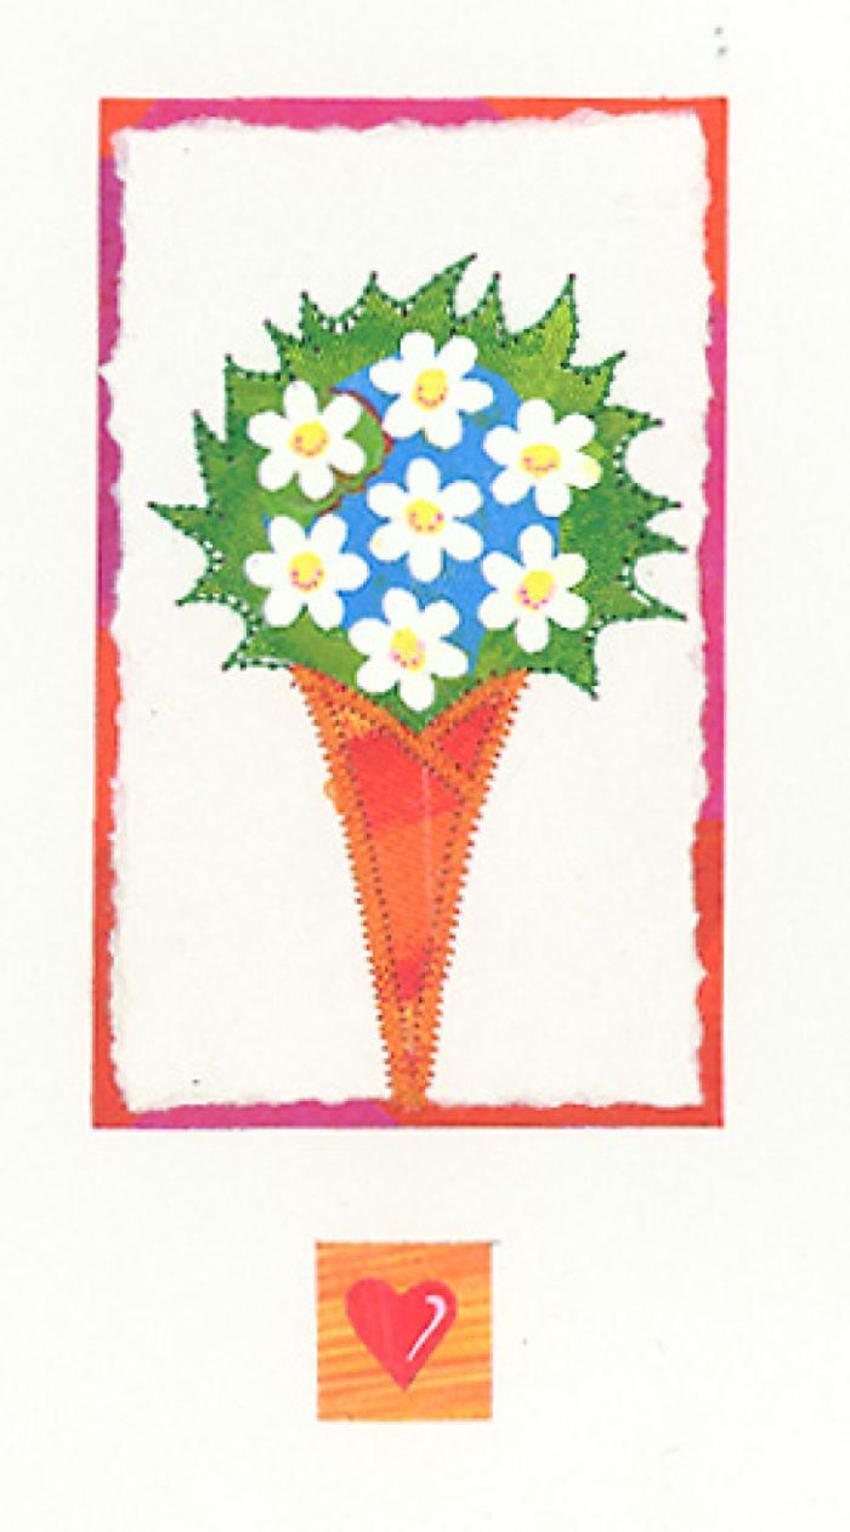 PD NATURE CARD 8.JPG